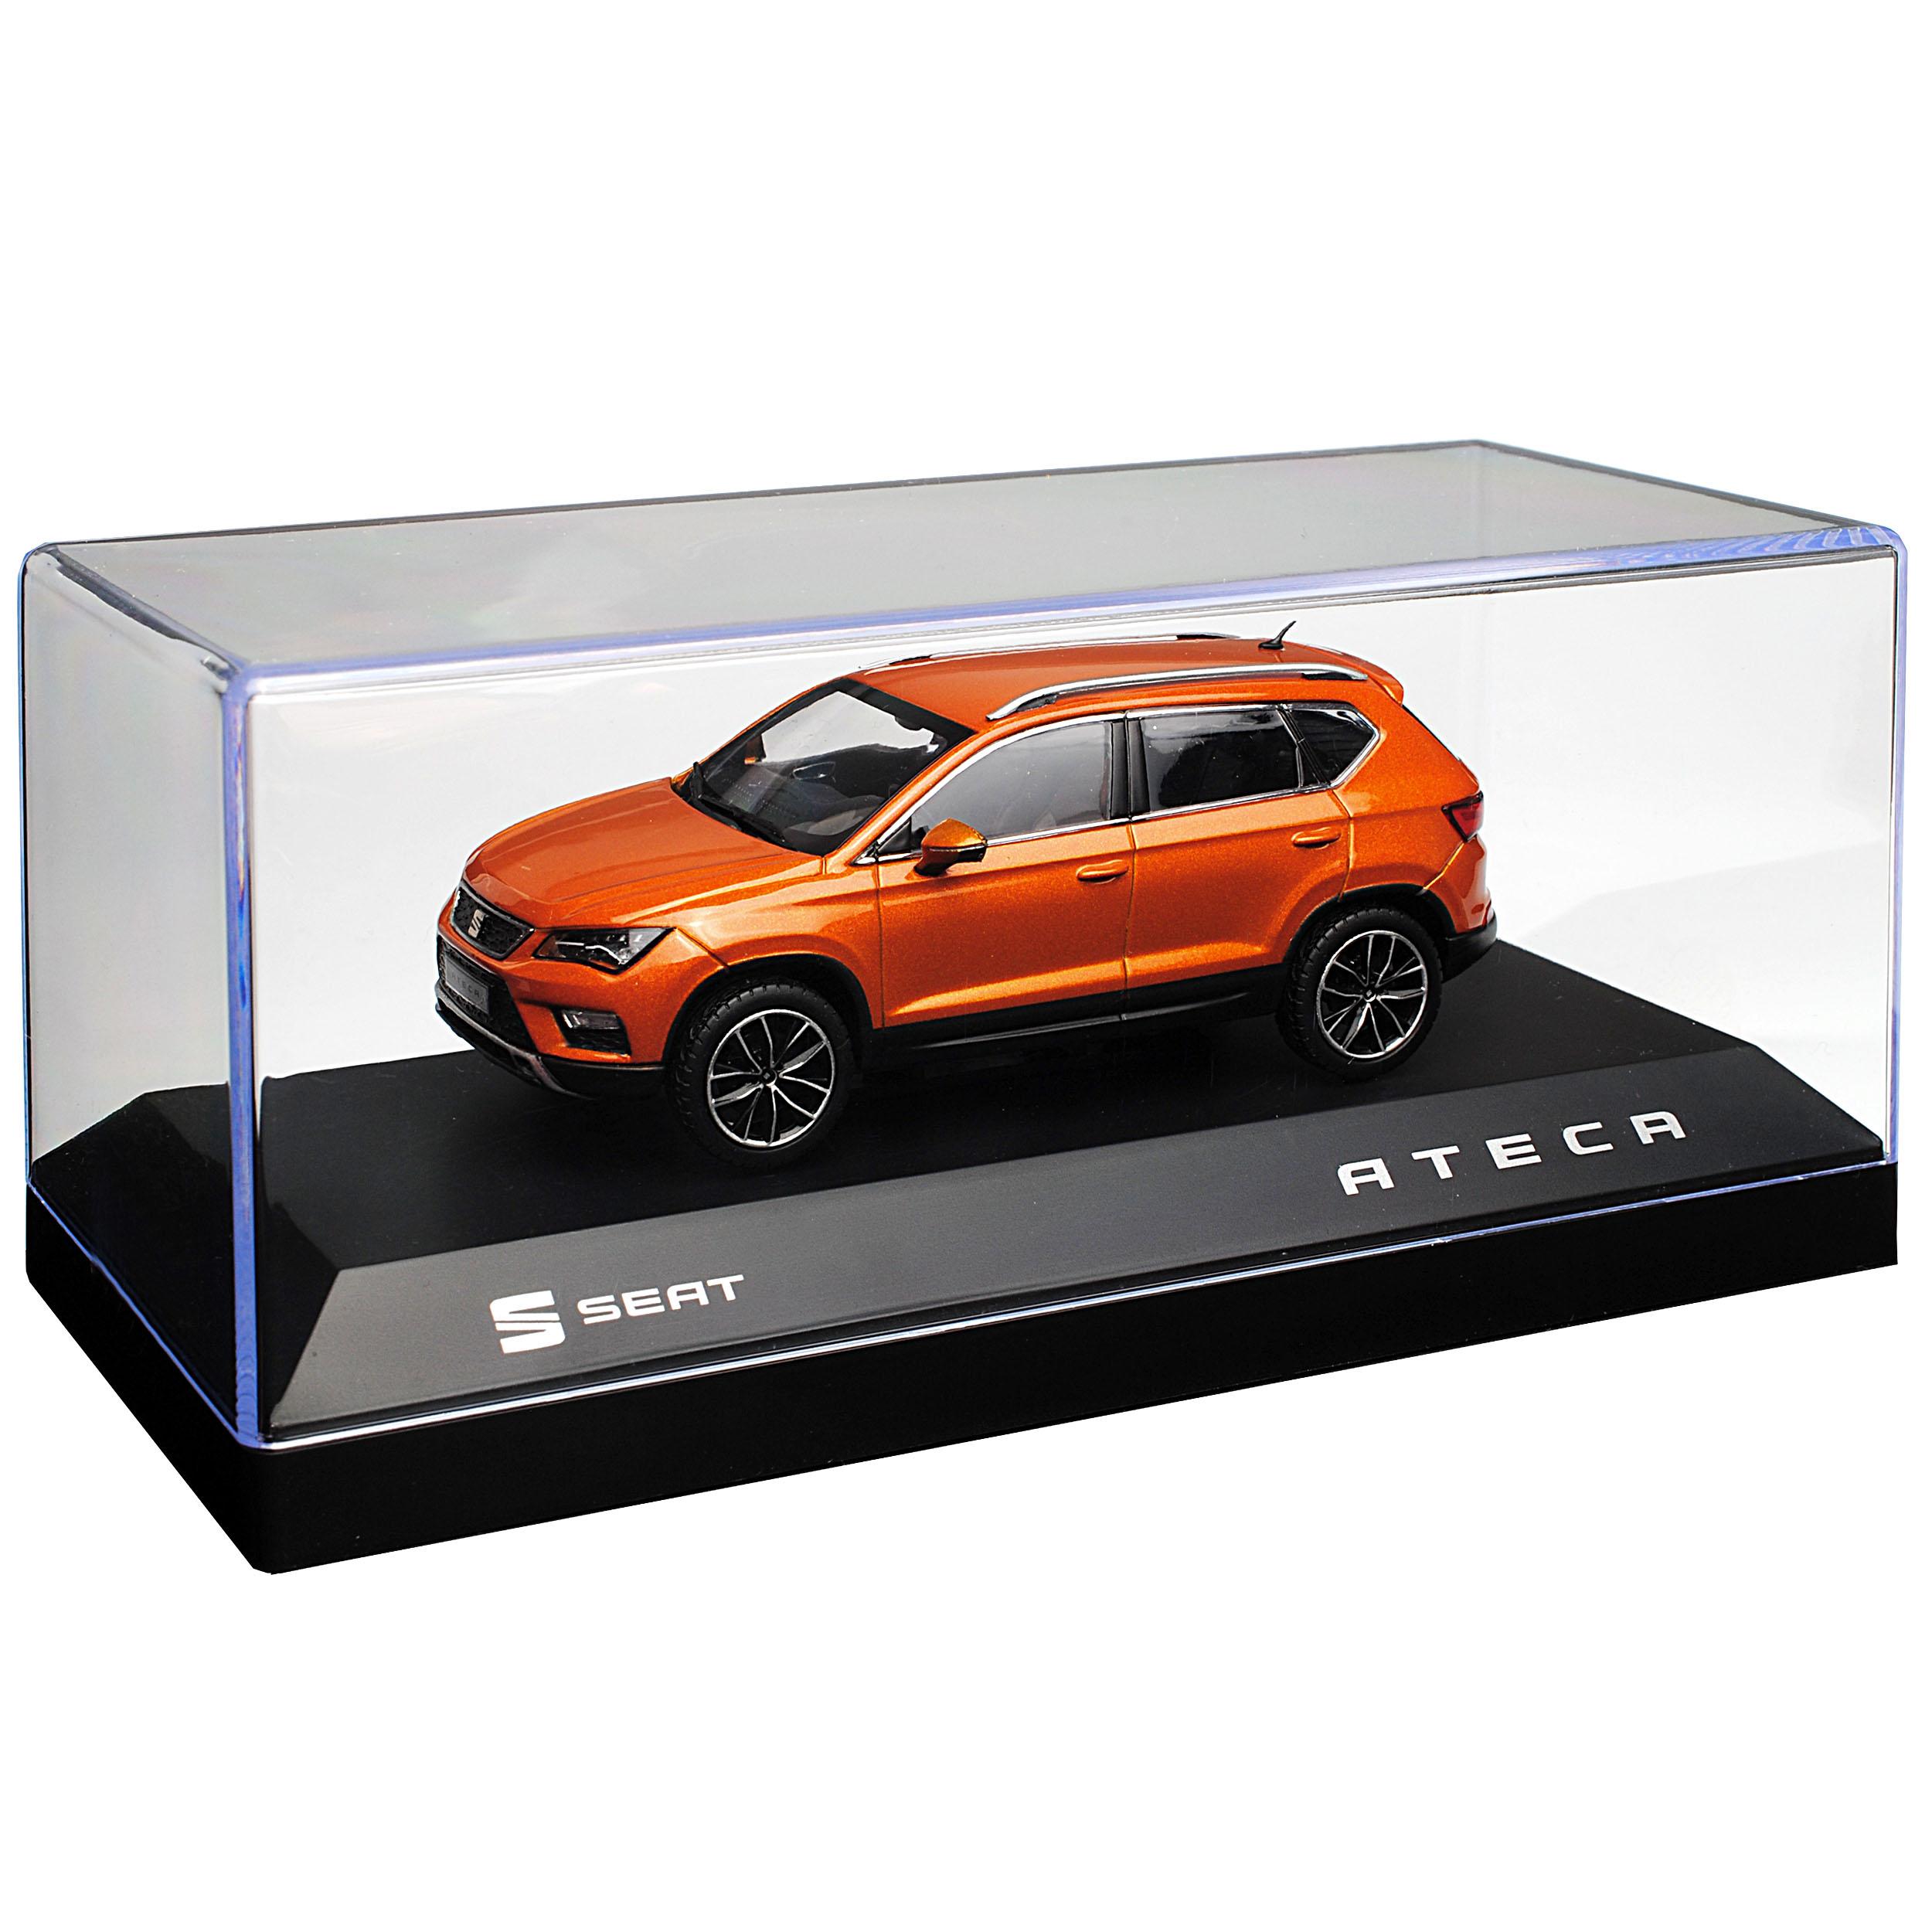 Seat Ateca SUV Samoa Orange Orange Orange Ab 2016 1 43 PremiumX Modell Auto mit oder ohne in.. 06b035